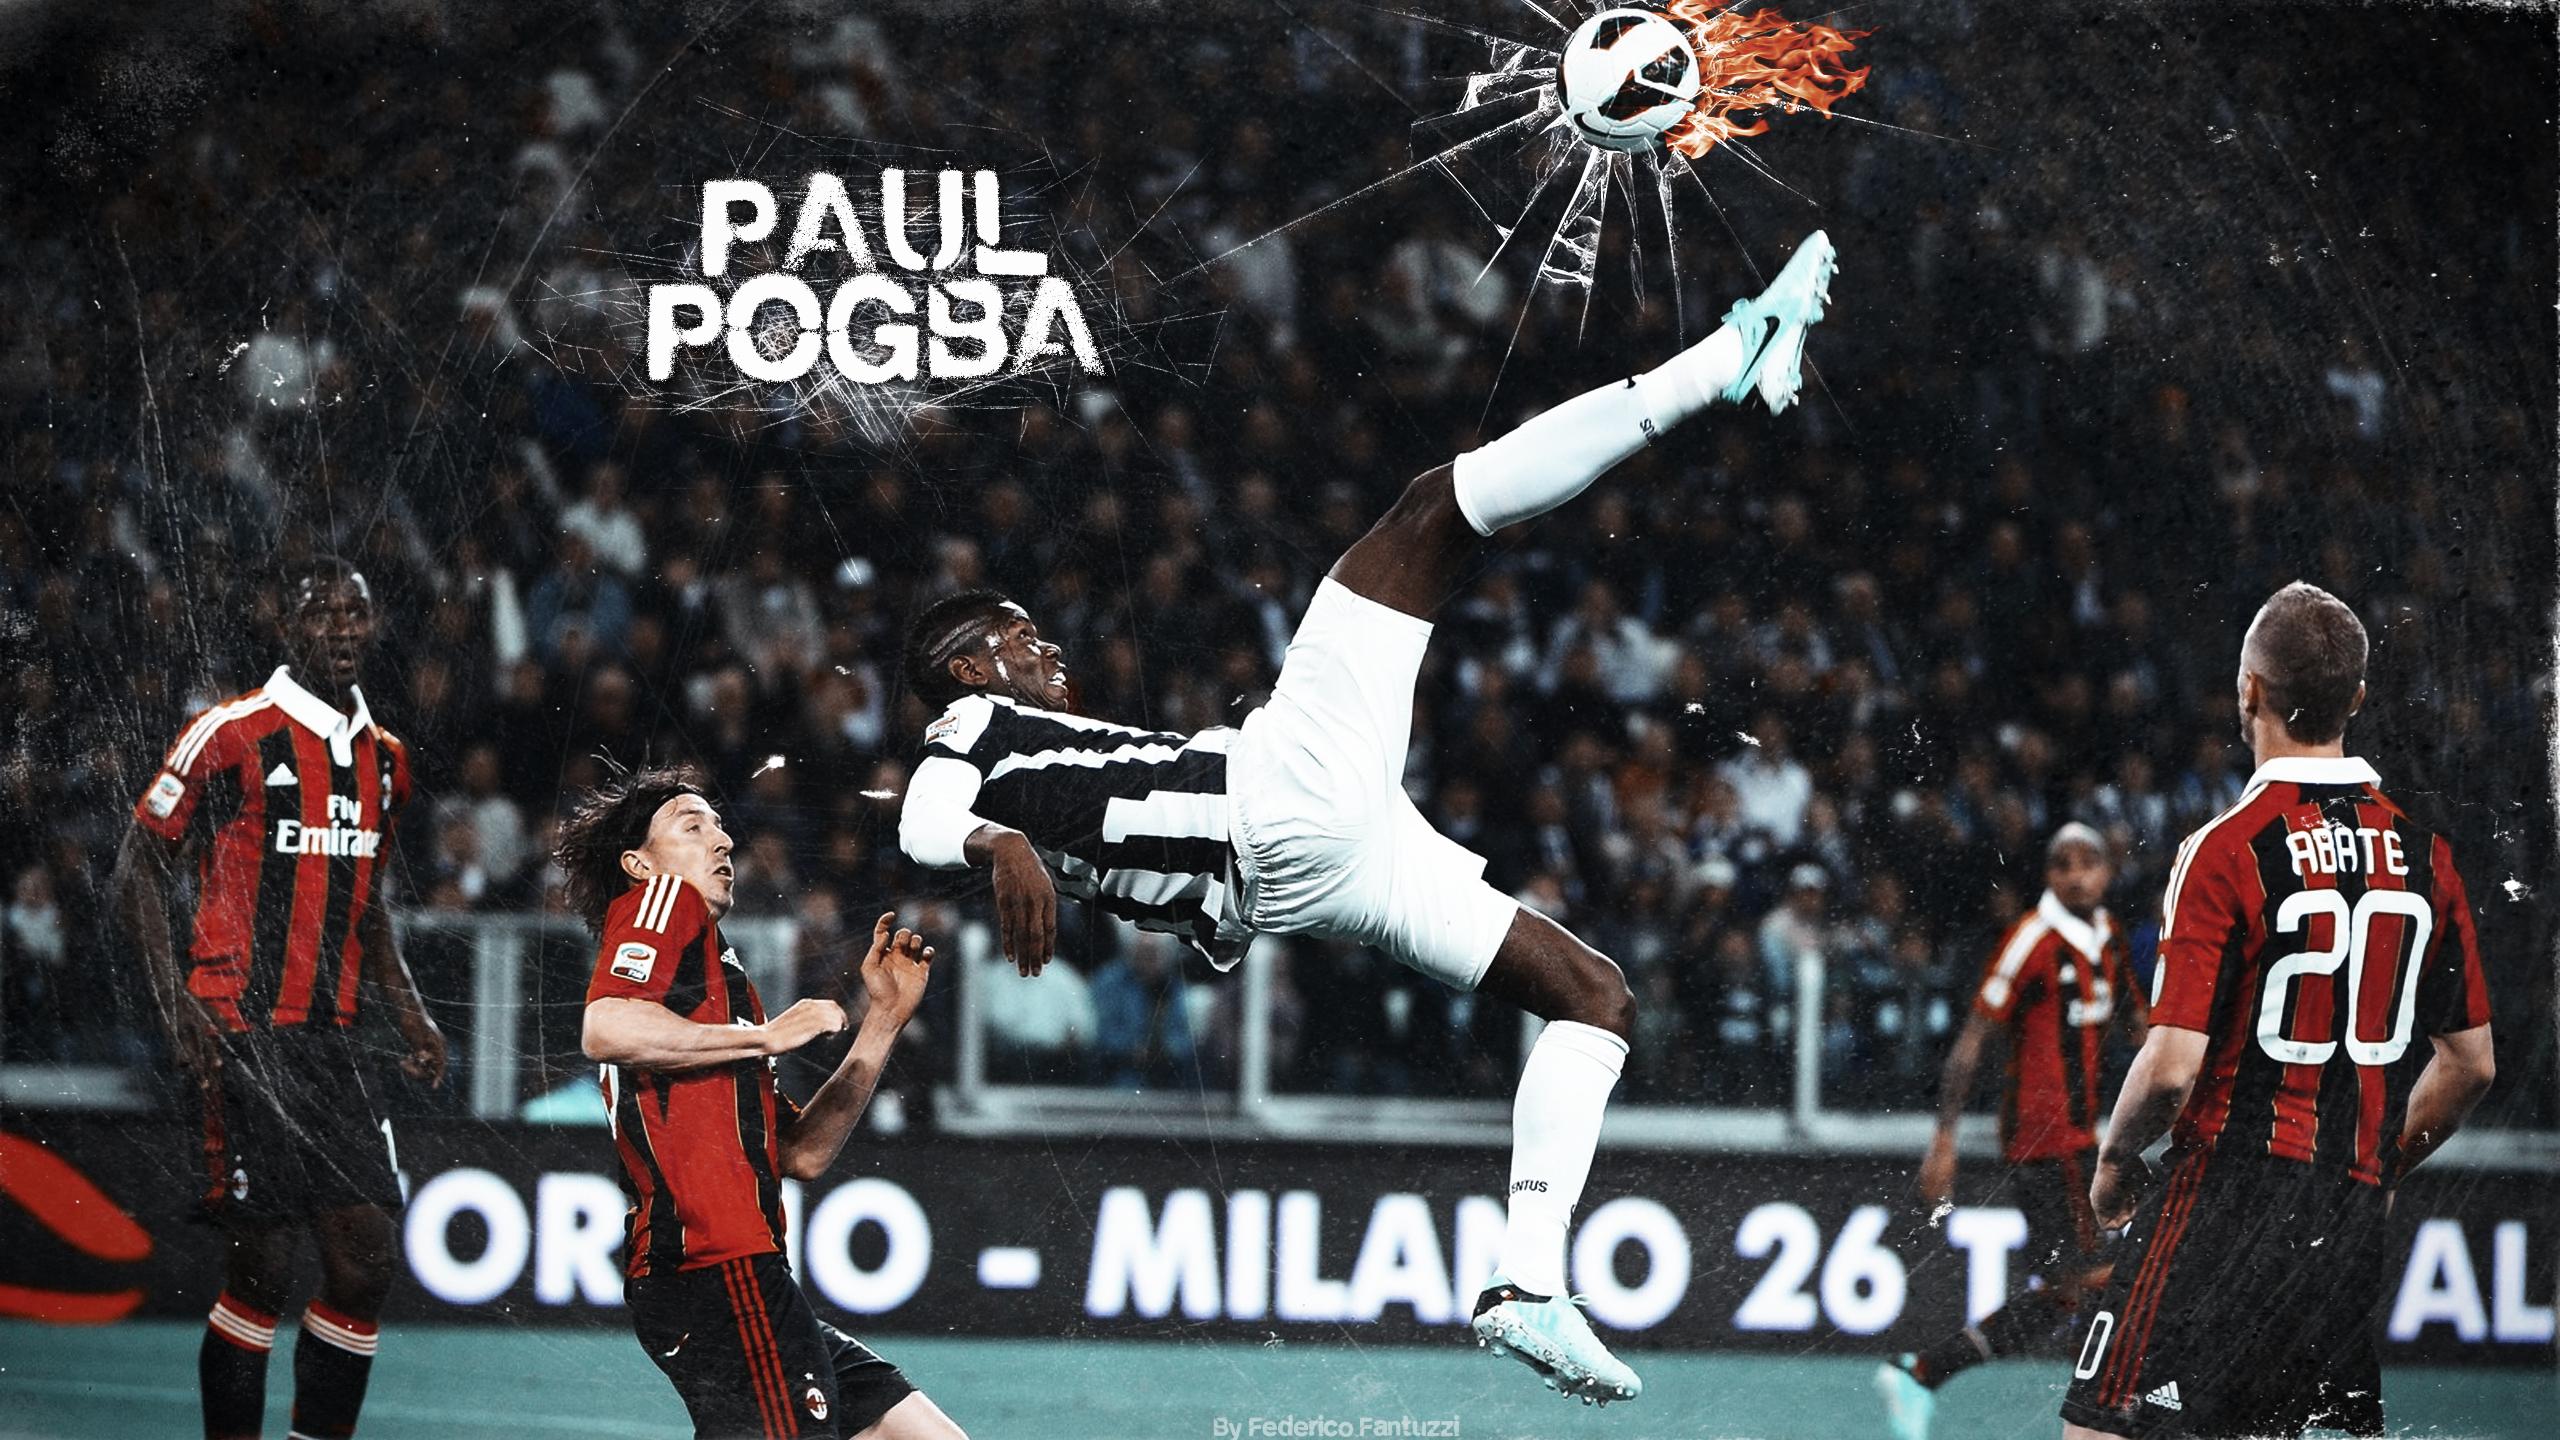 Paul Labile Pogba Wallpapers HQ